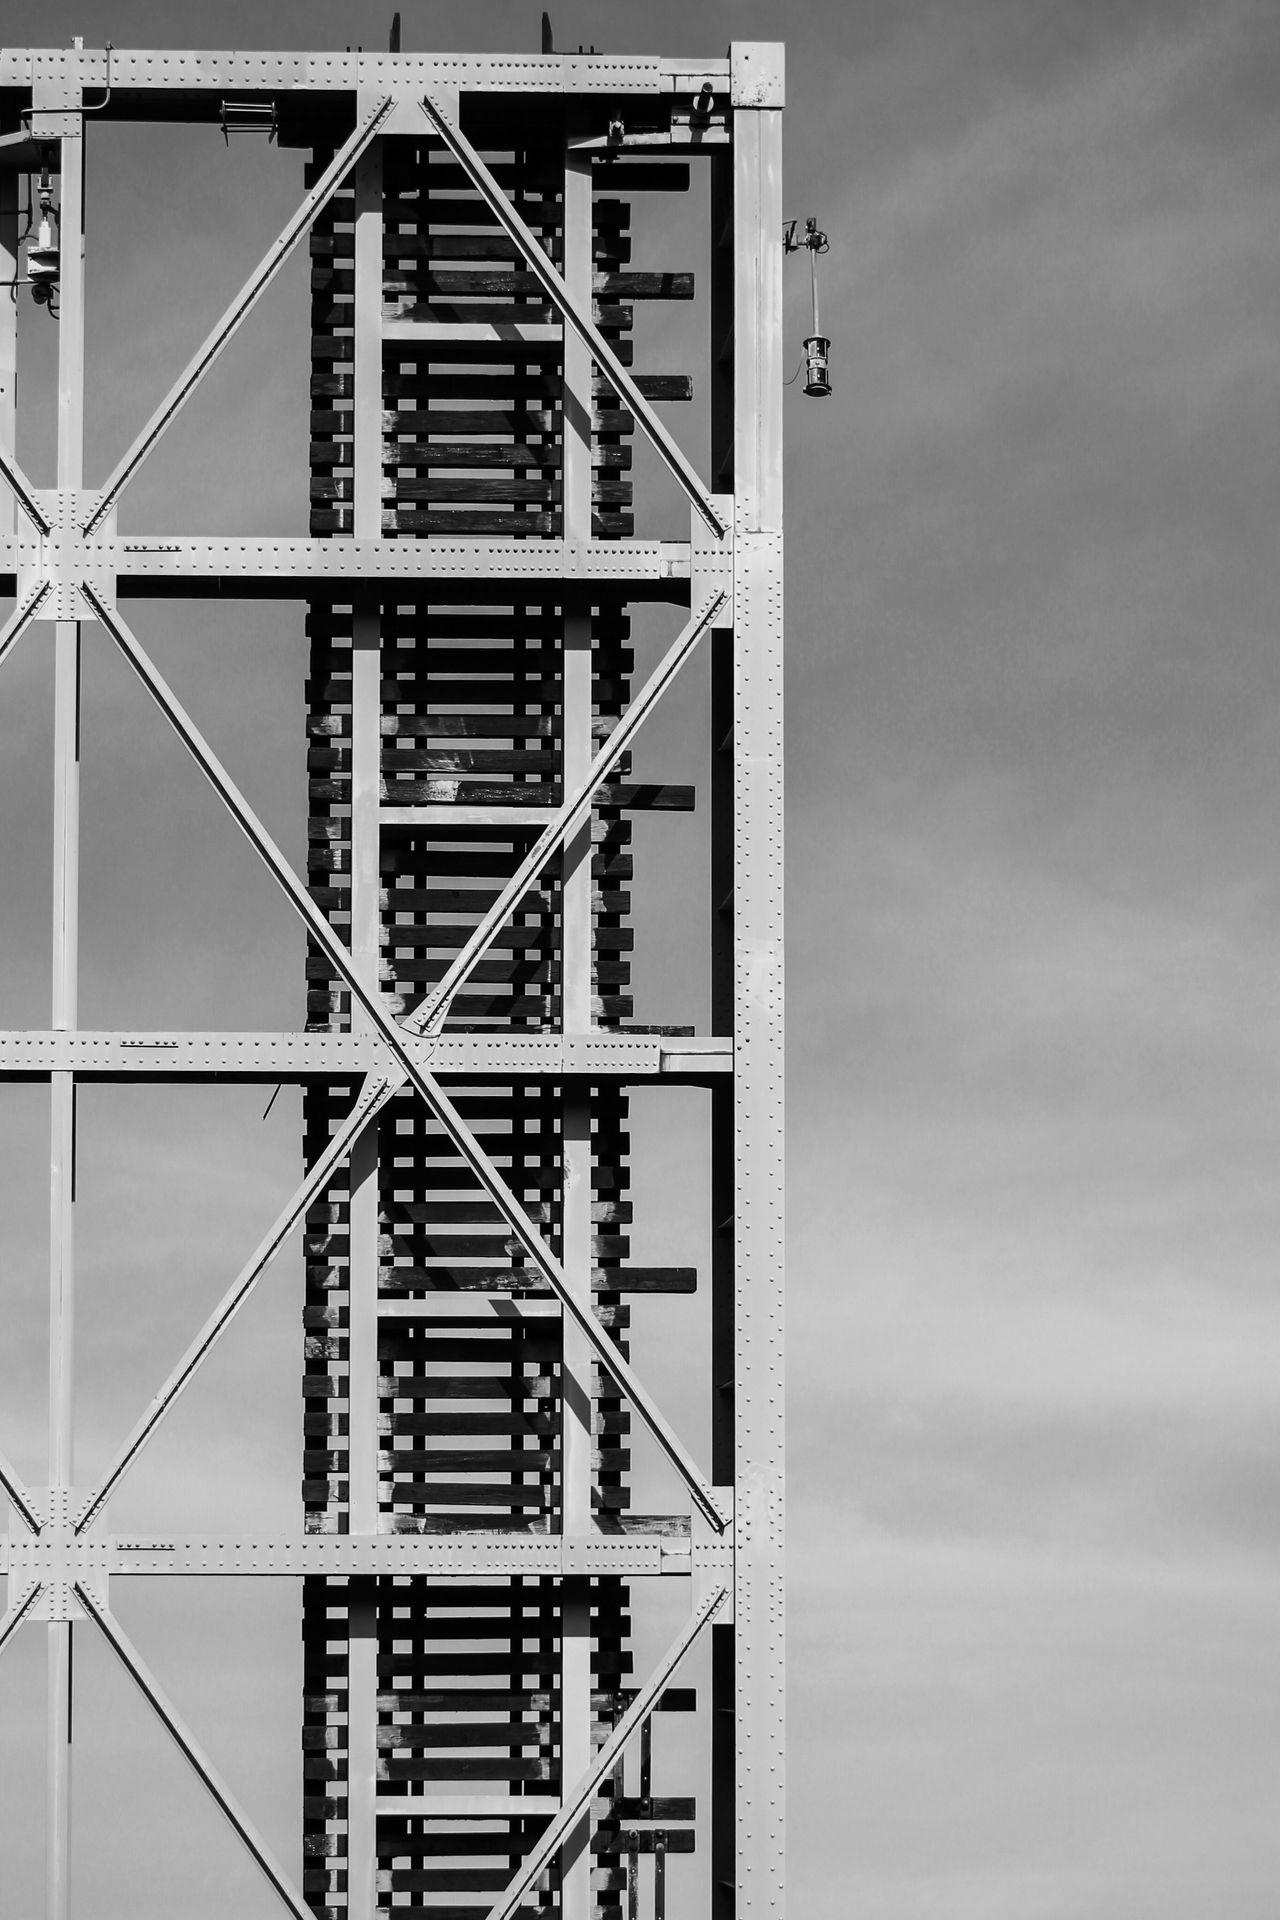 Architecture Built Structure Sky Train Tracks Drawbridge  Drawbridge Up Blackandwhite Black And White Black & White Outdoors Day No People Nature